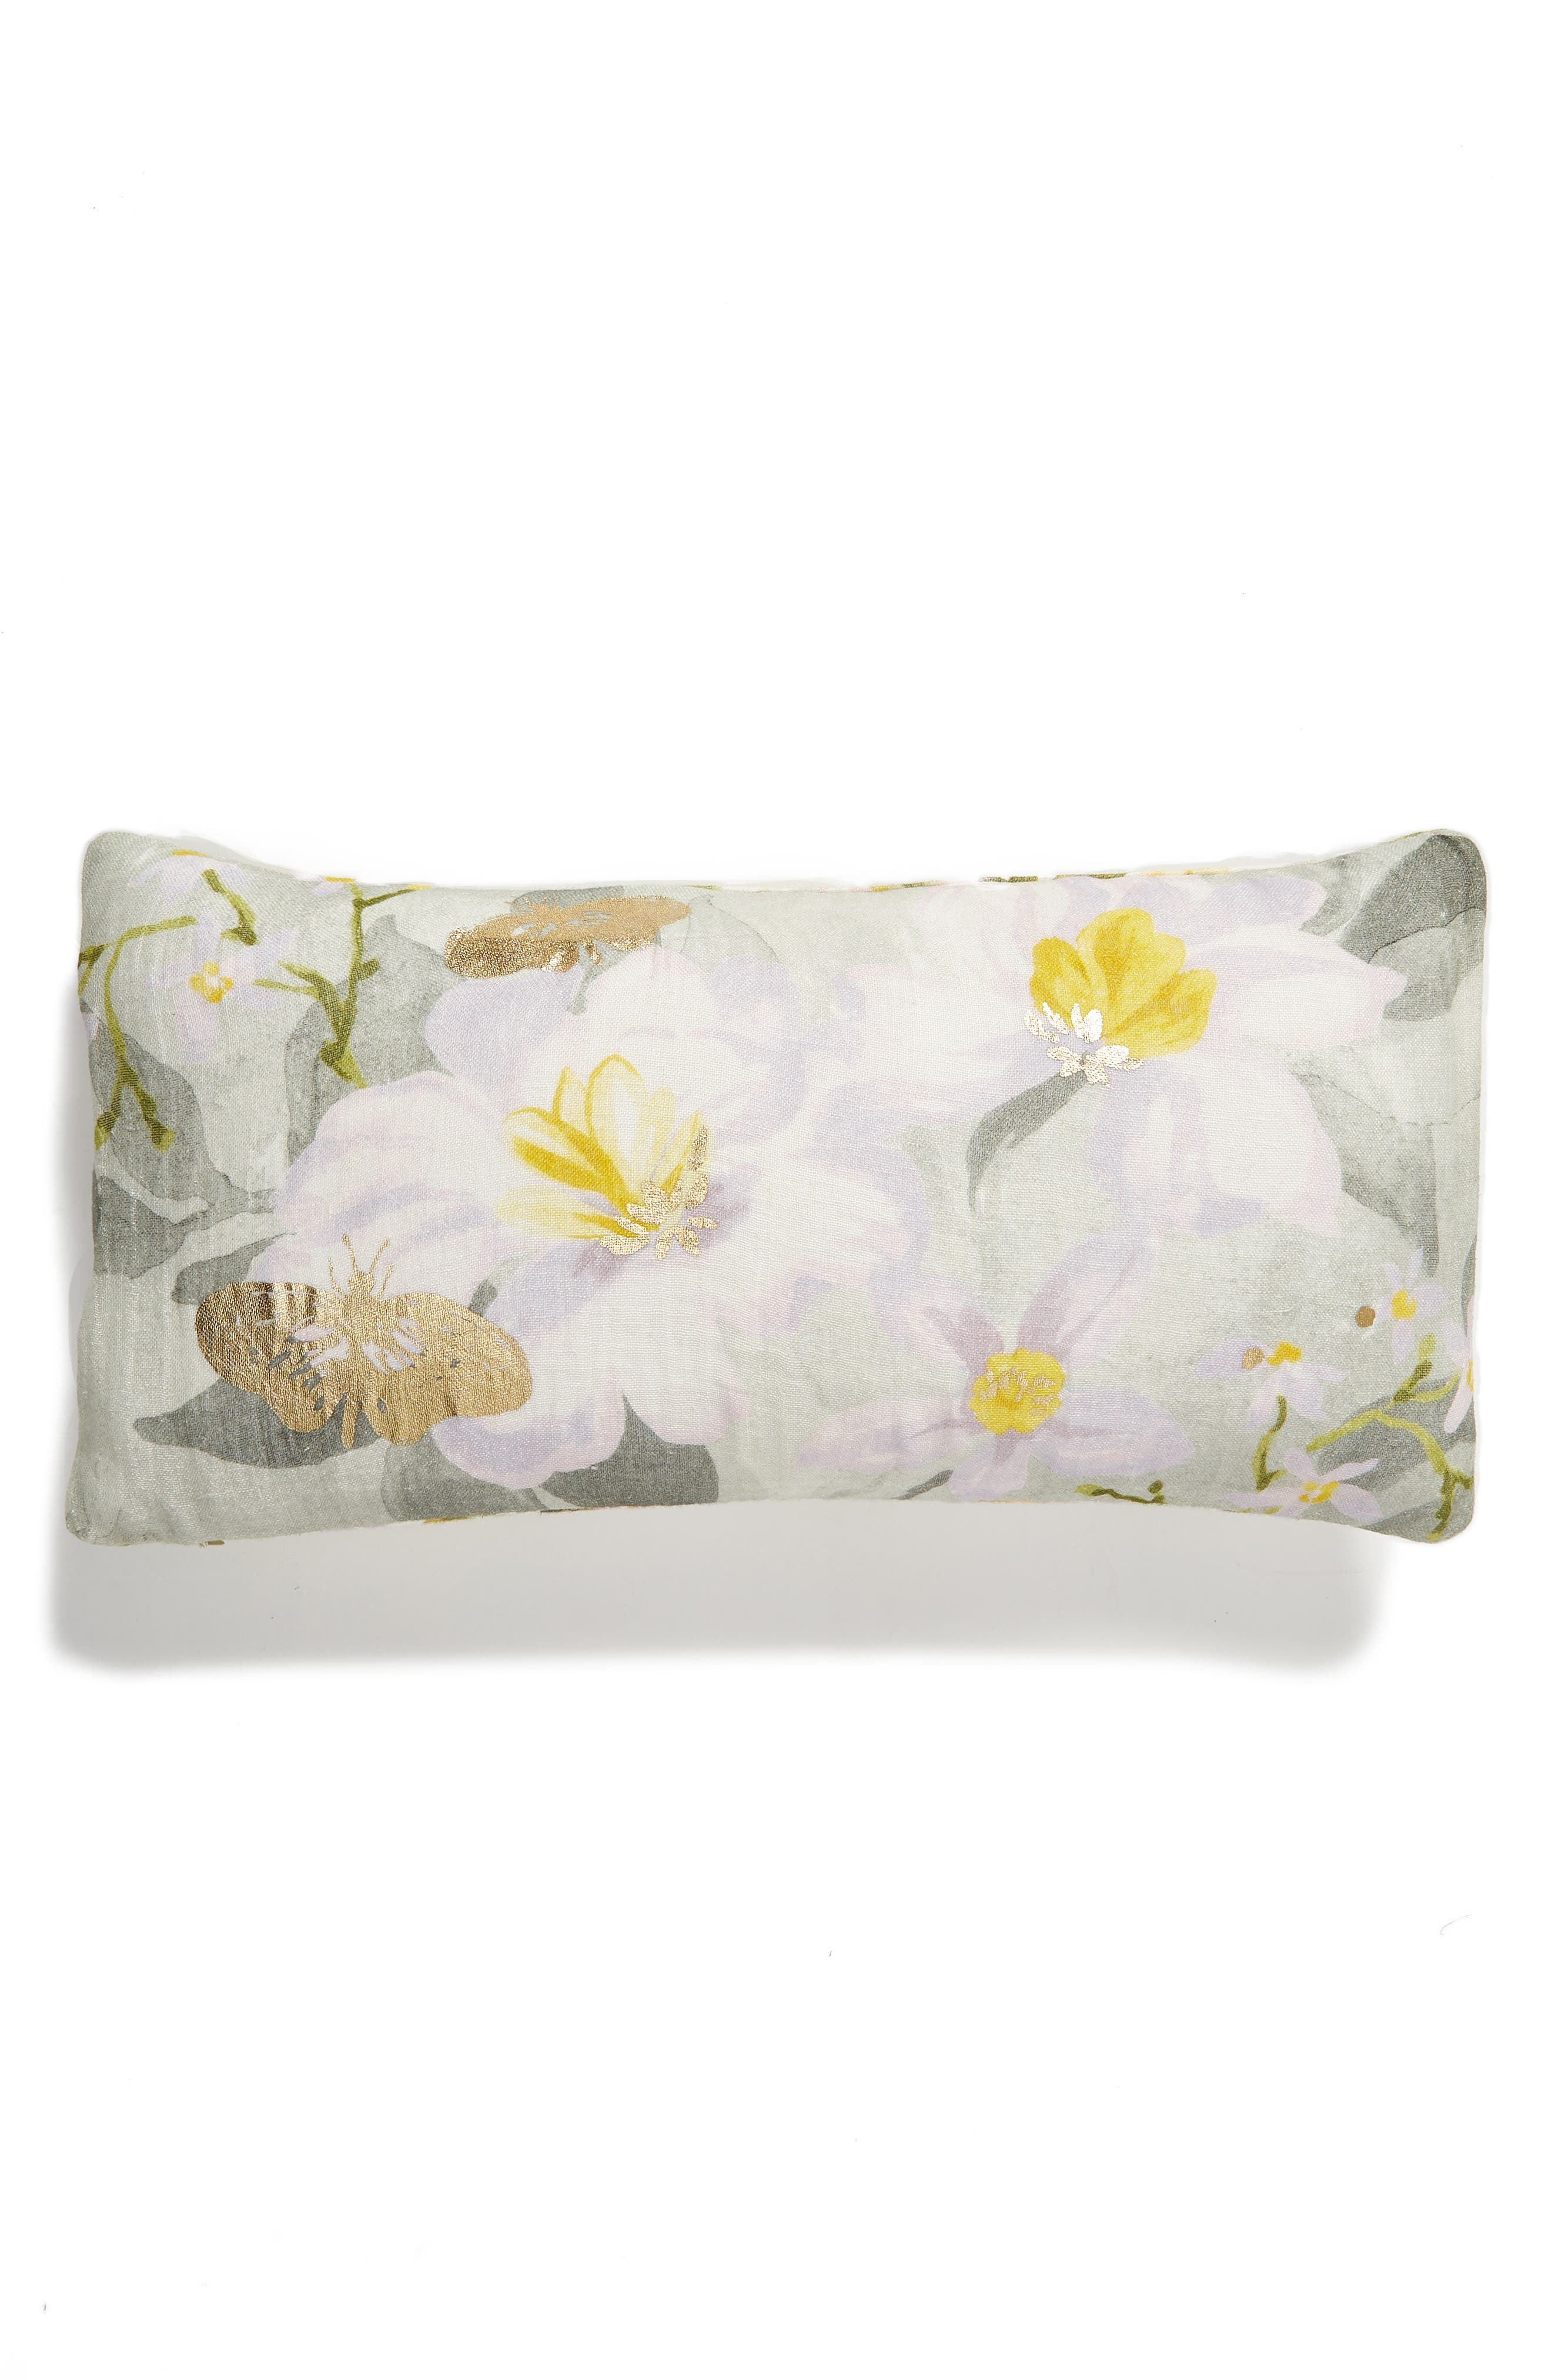 NORDSTROM AT HOME, Floral Linen Accent Pillow, Main thumbnail 1, color, GREY VAPOR MULTI